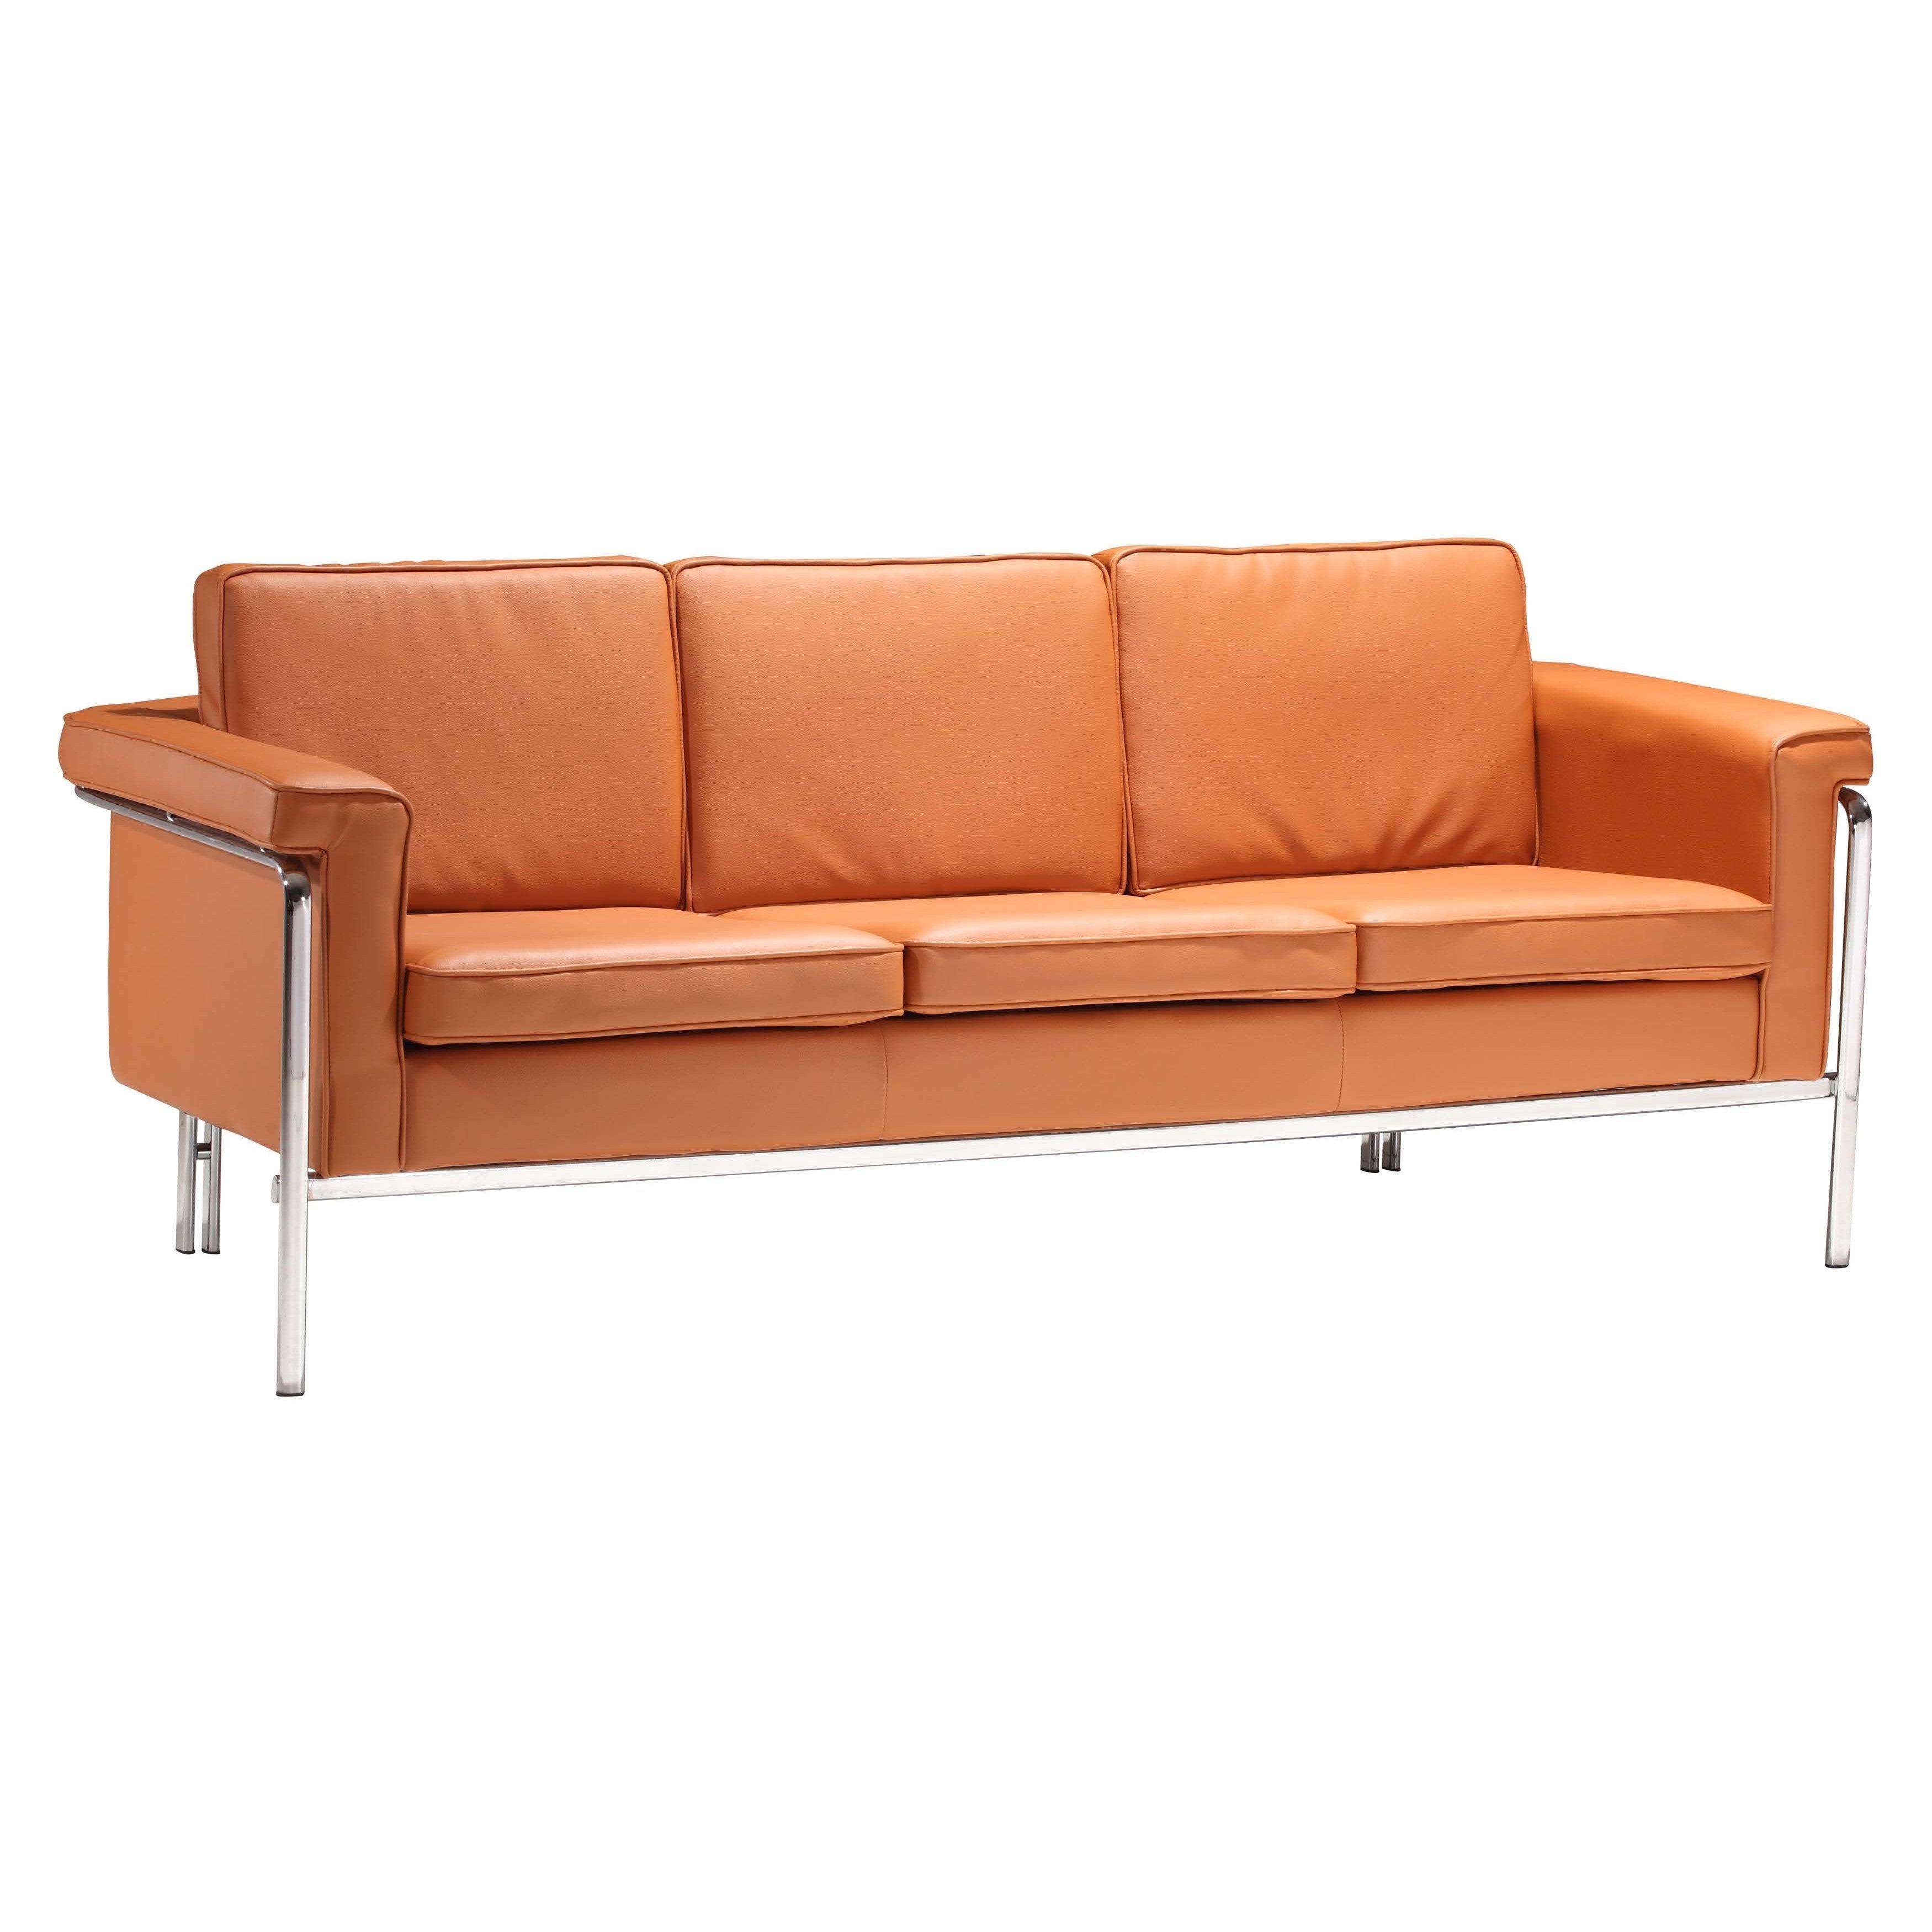 Singular Sofa (Option: Orange)